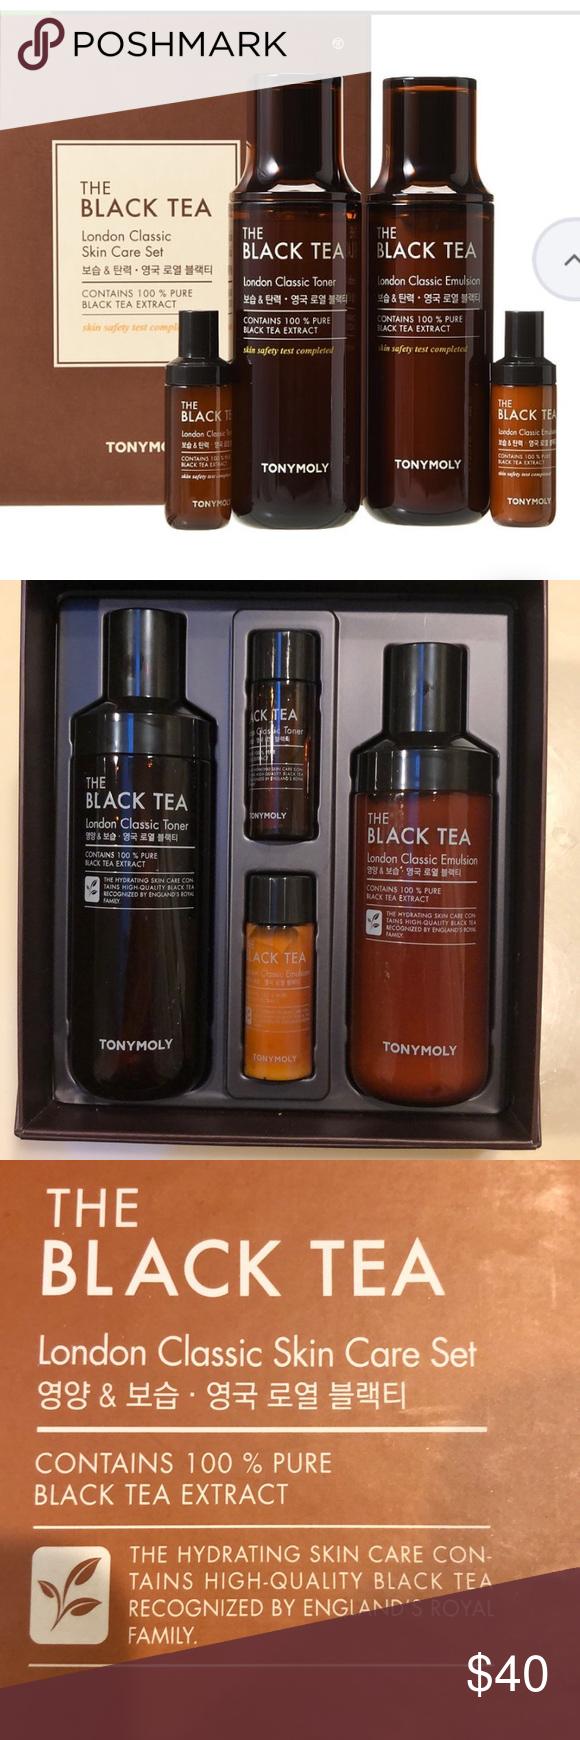 Tony Moly London Classic Skin Care Set Black Tea Skincare Set Skin Care Black Tea